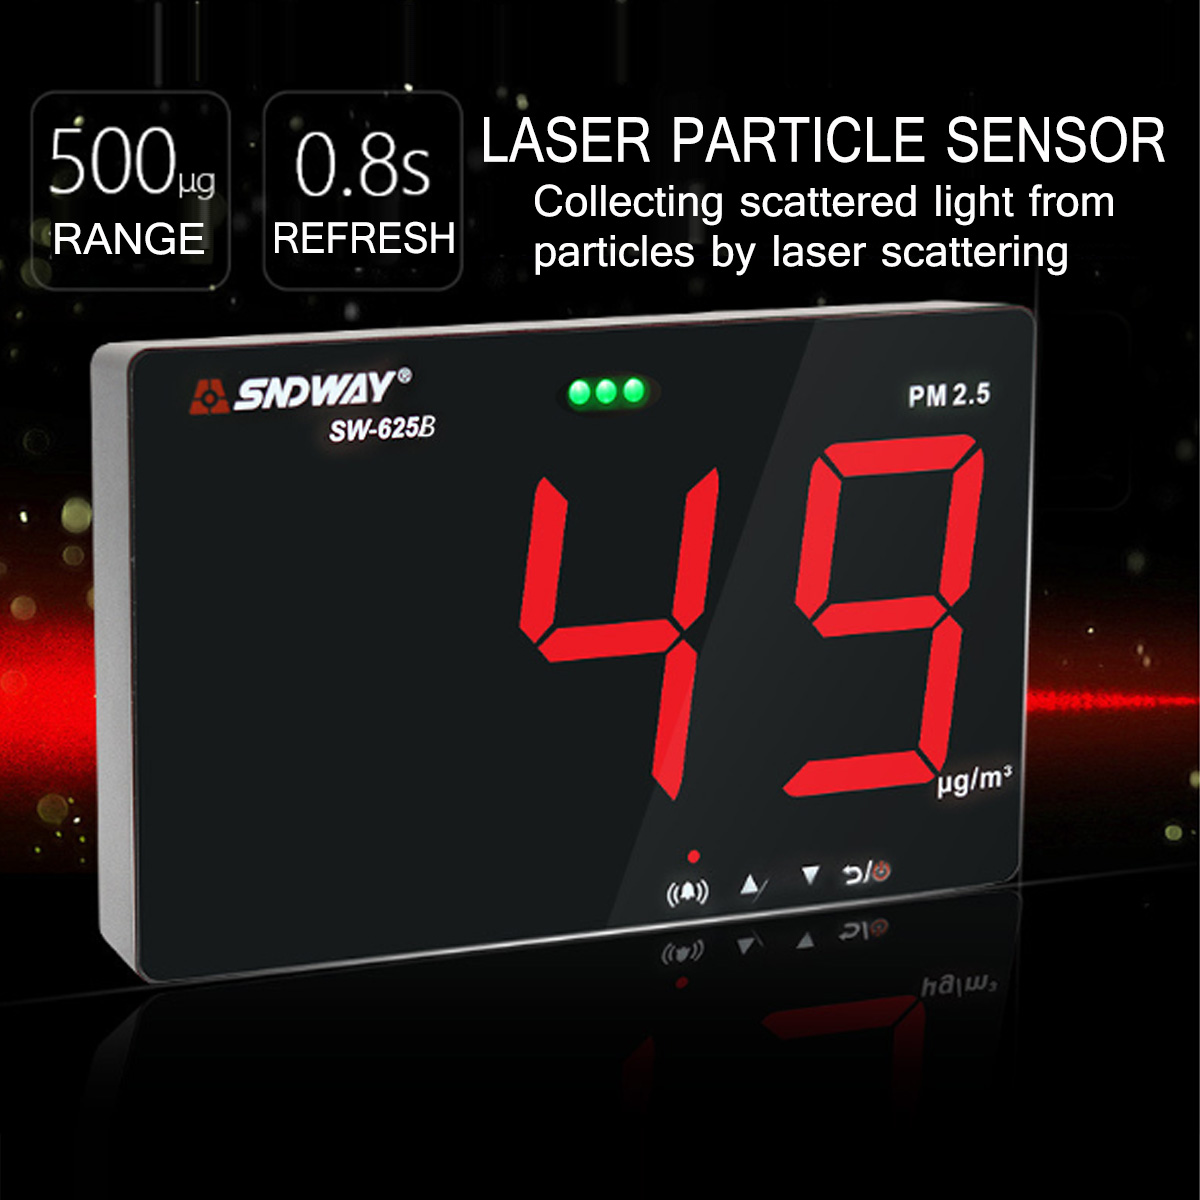 Digital Air Quality Monitor Laser PM2.5 Detector Gas Monitor Analyzer Meter Diagnostic Health Care ToolDigital Air Quality Monitor Laser PM2.5 Detector Gas Monitor Analyzer Meter Diagnostic Health Care Tool